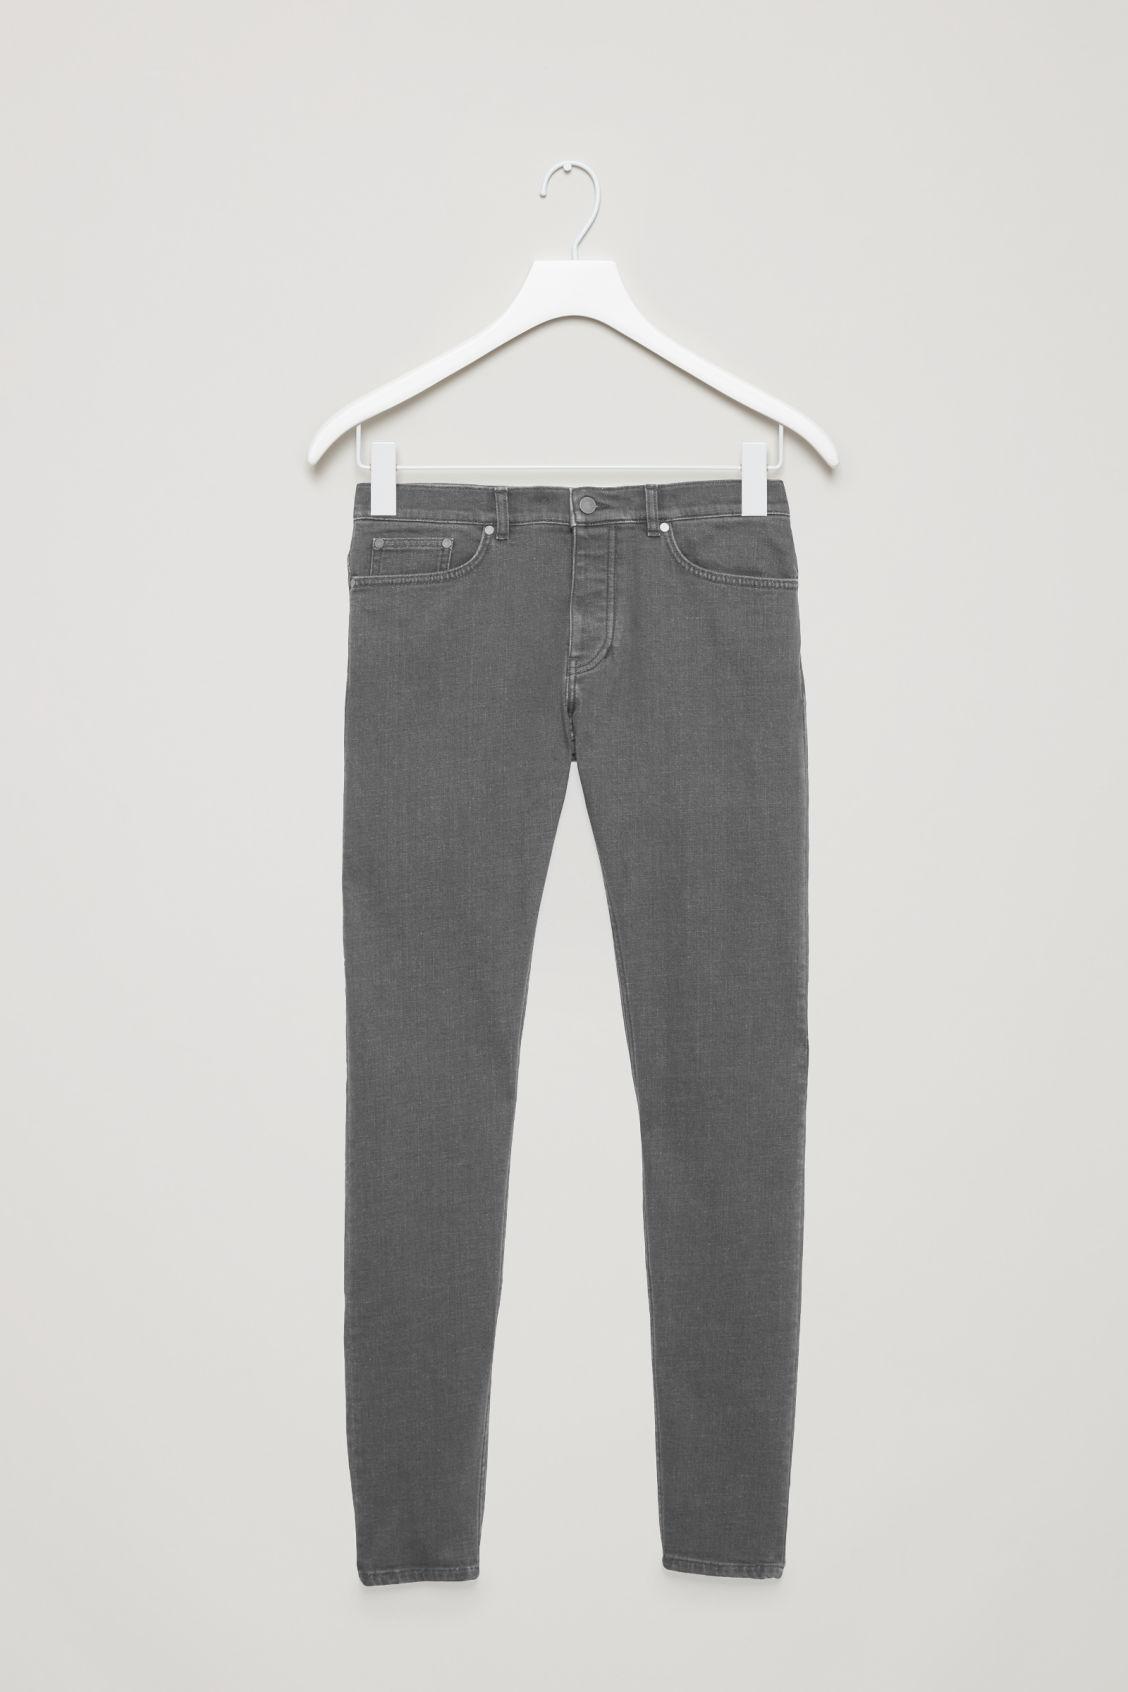 Lyst Cos Slim Tapered Jeans In Gray For Men Hanger Marksspencer Gallery